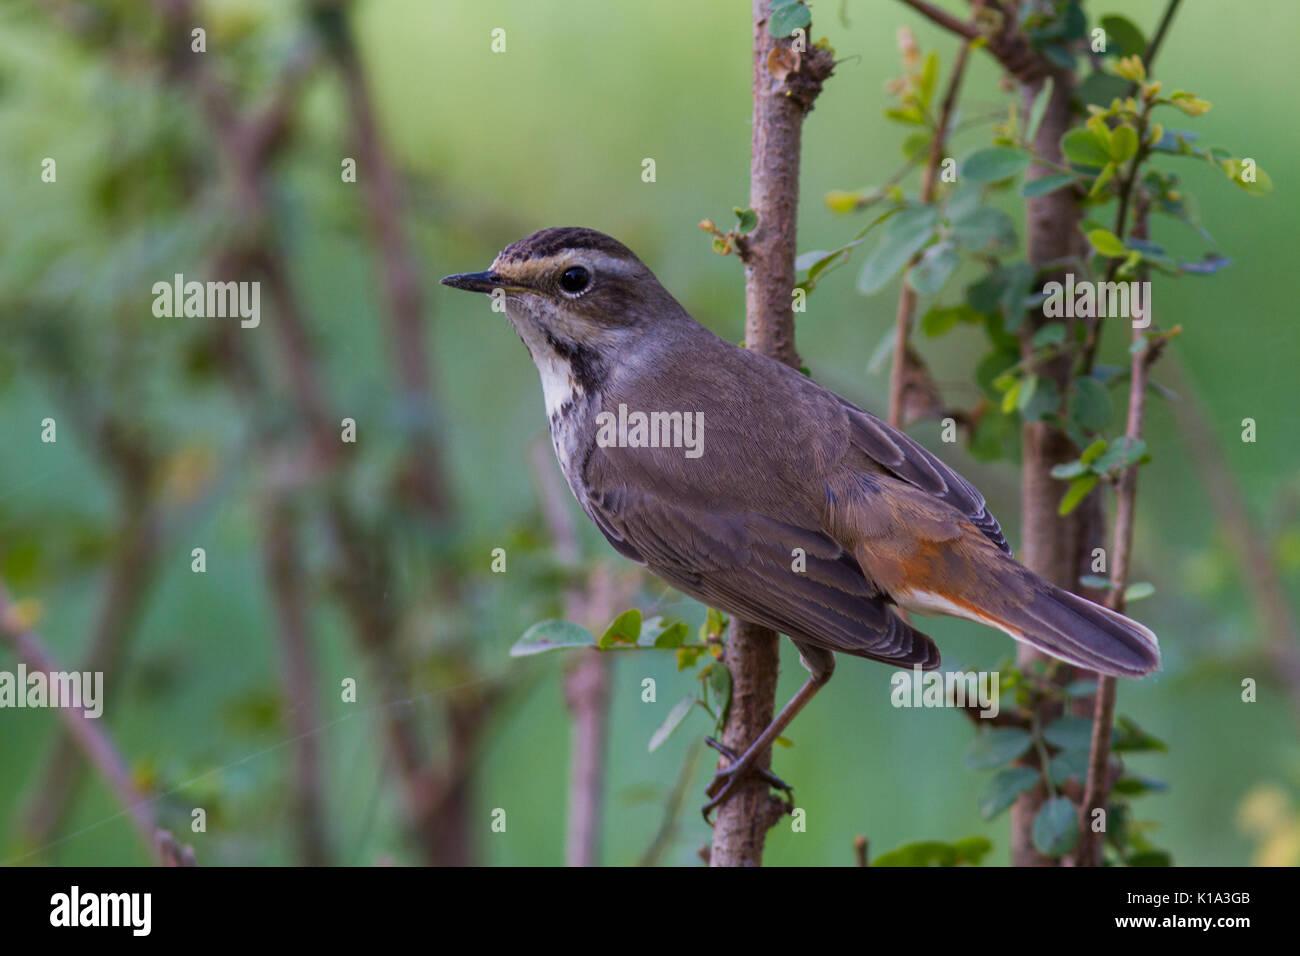 The bluethroat (Luscinia svecica) at Bharatpur bird sanctuary in Rajasthan - Stock Image